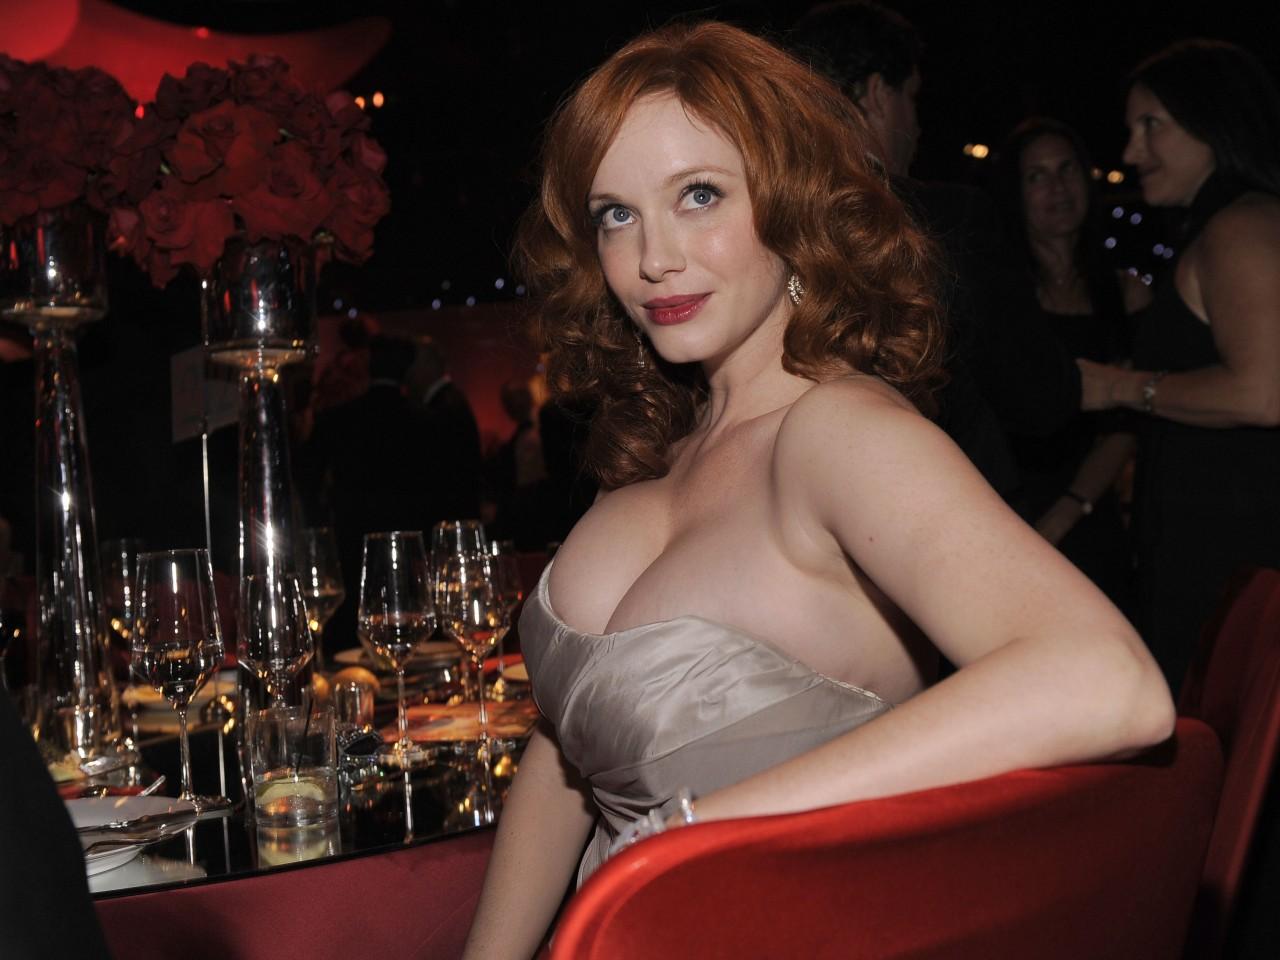 ... christina hendricks breasts cleavage the emmys entertainment news